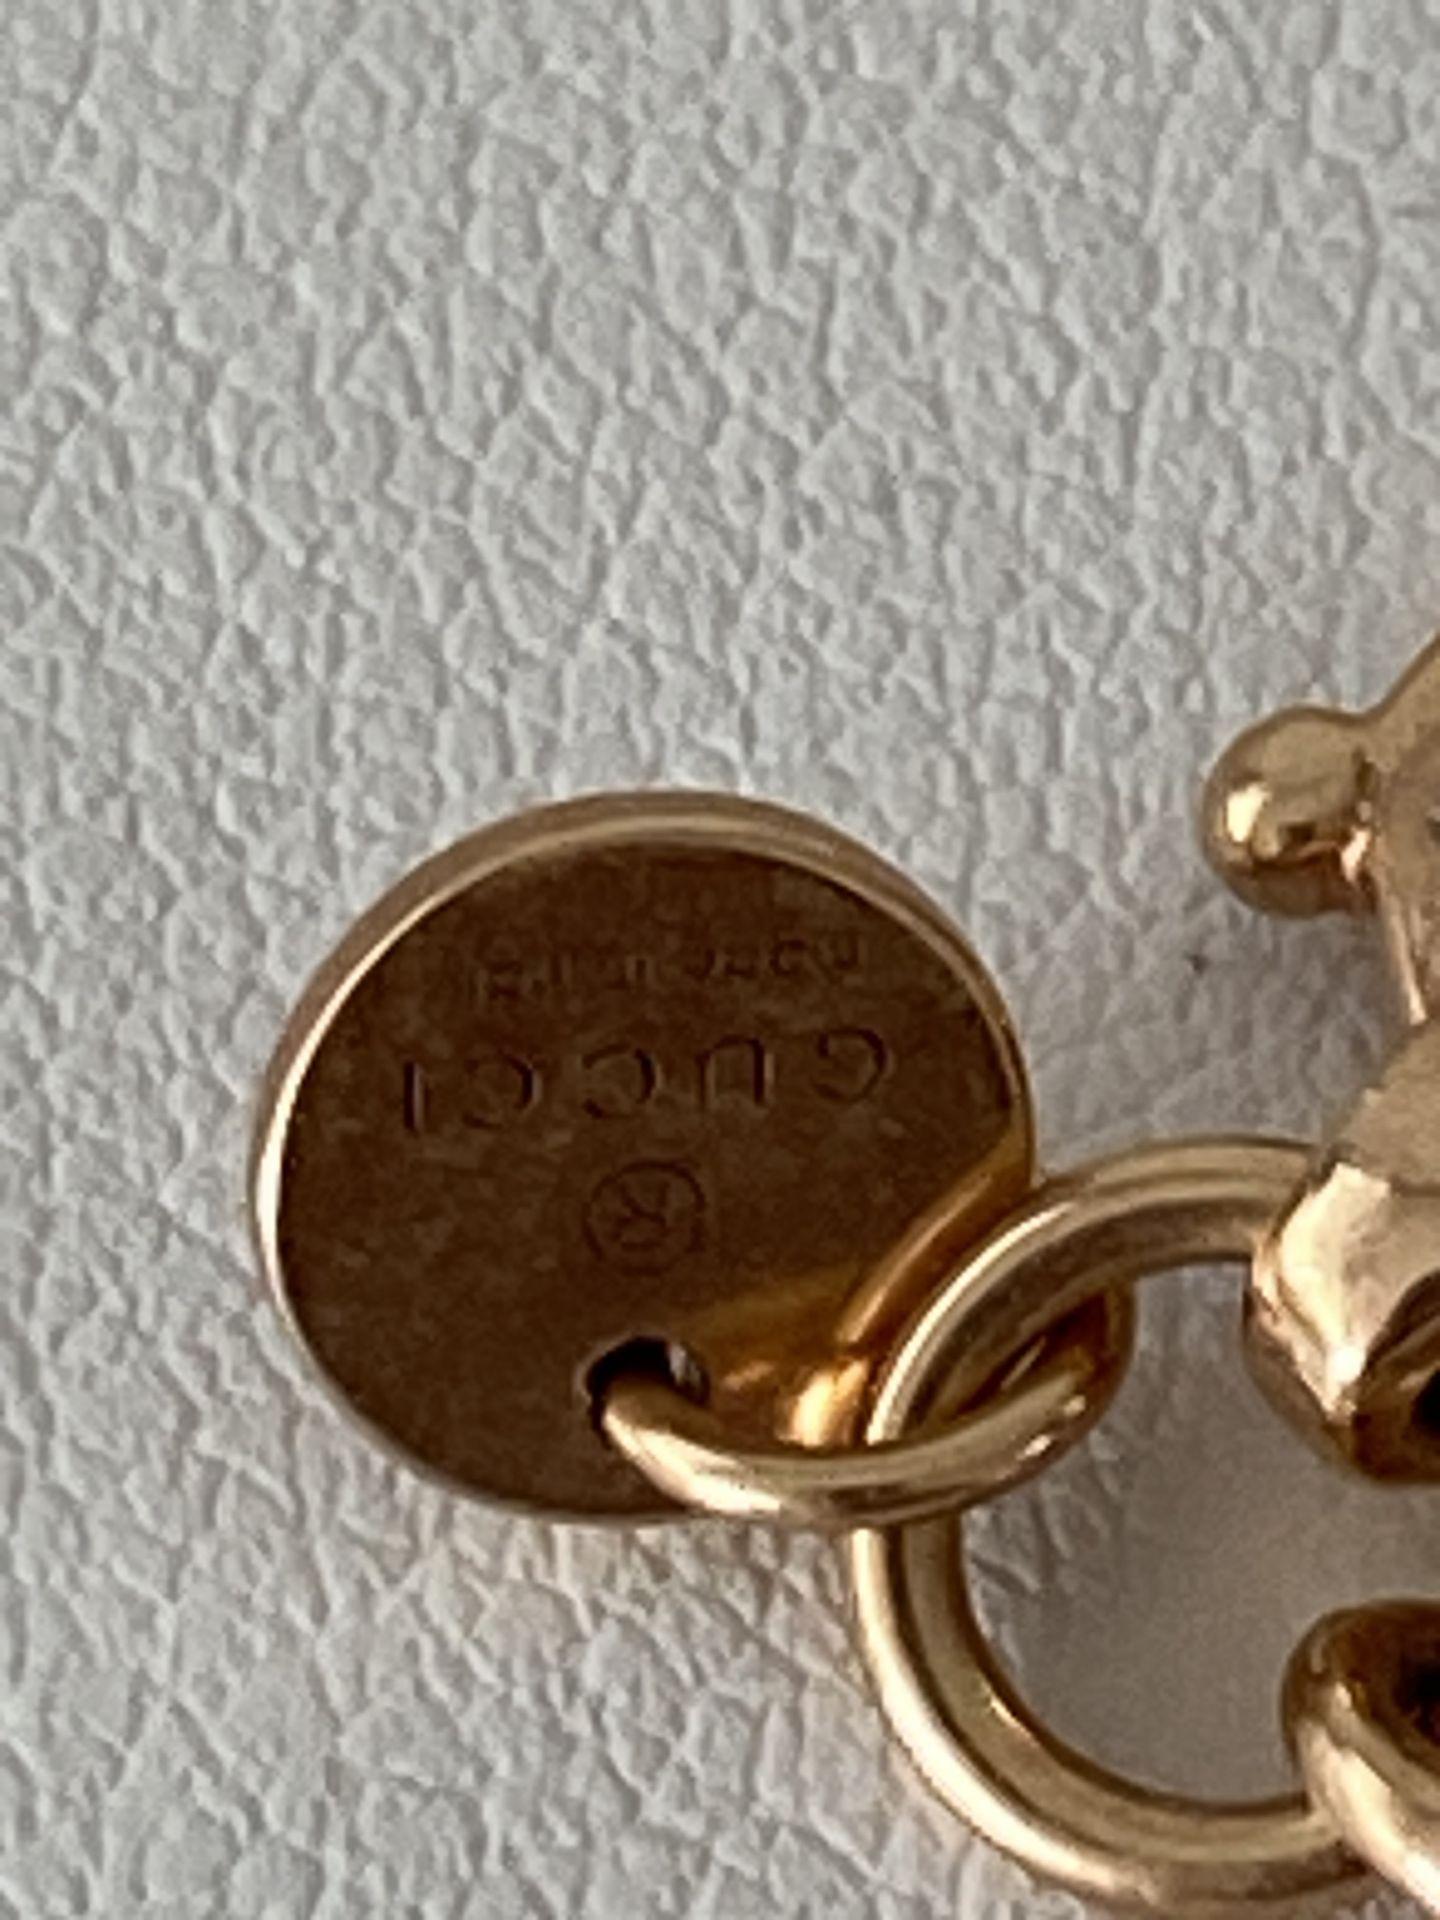 GUCCI 18ct ROSE GOLD HORSEBIT CHAIN - Image 4 of 6